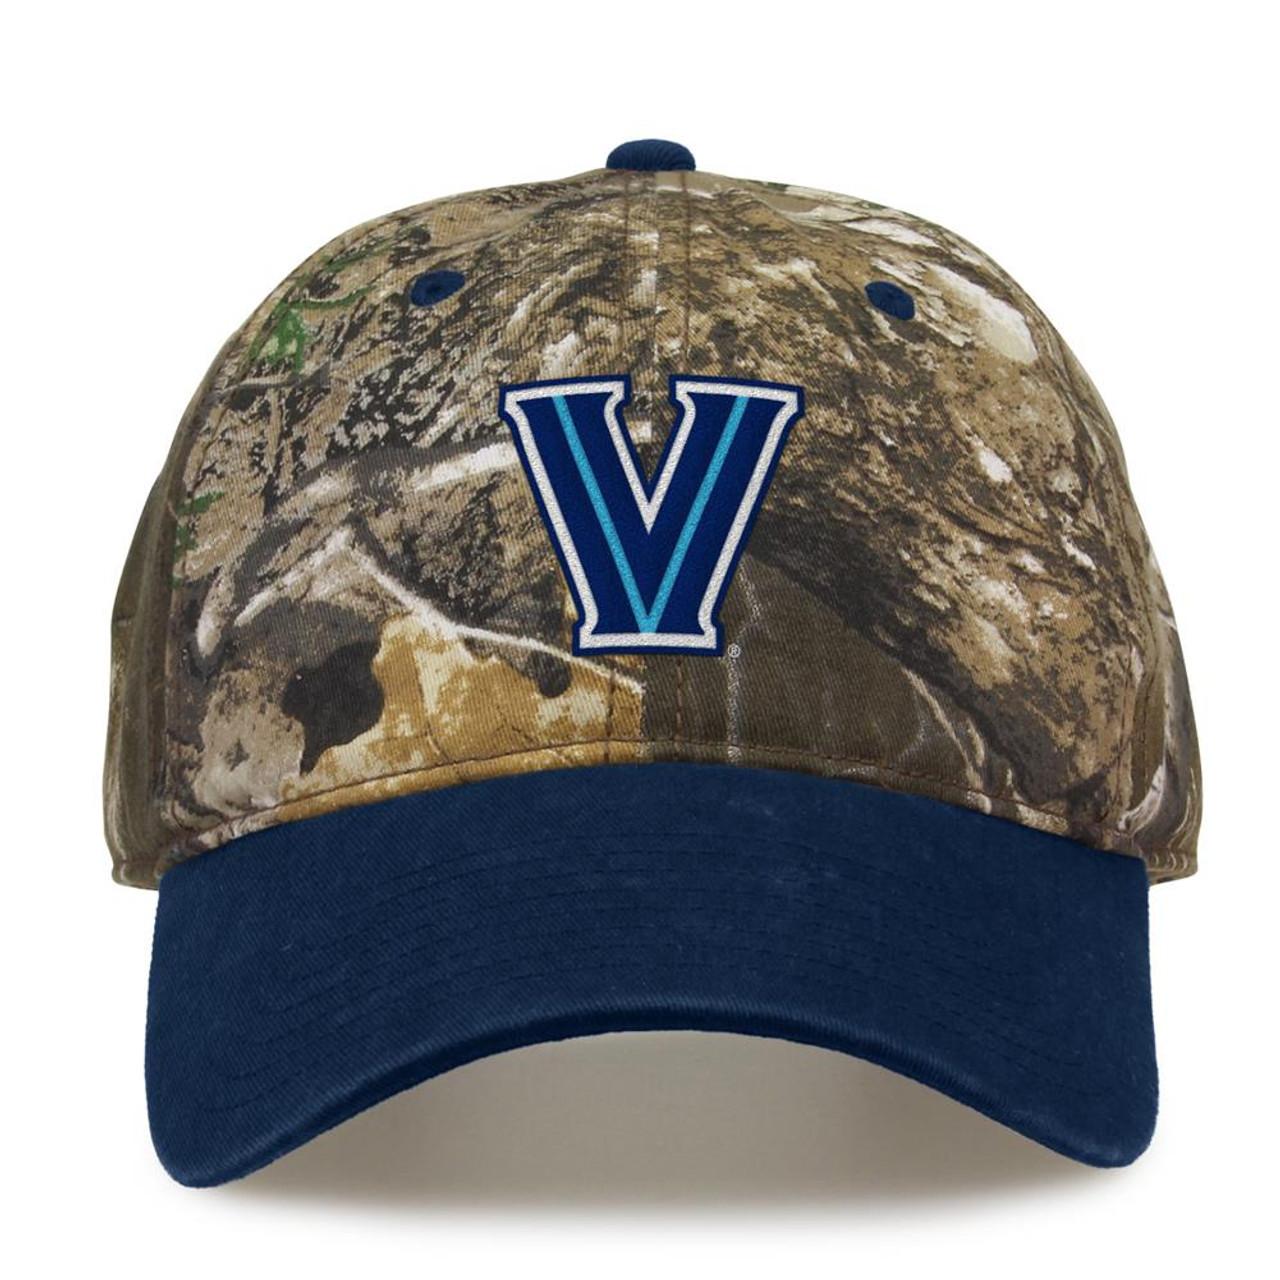 Villanova University Camo Hat Realtree Edge Camo Two-Tone Cap